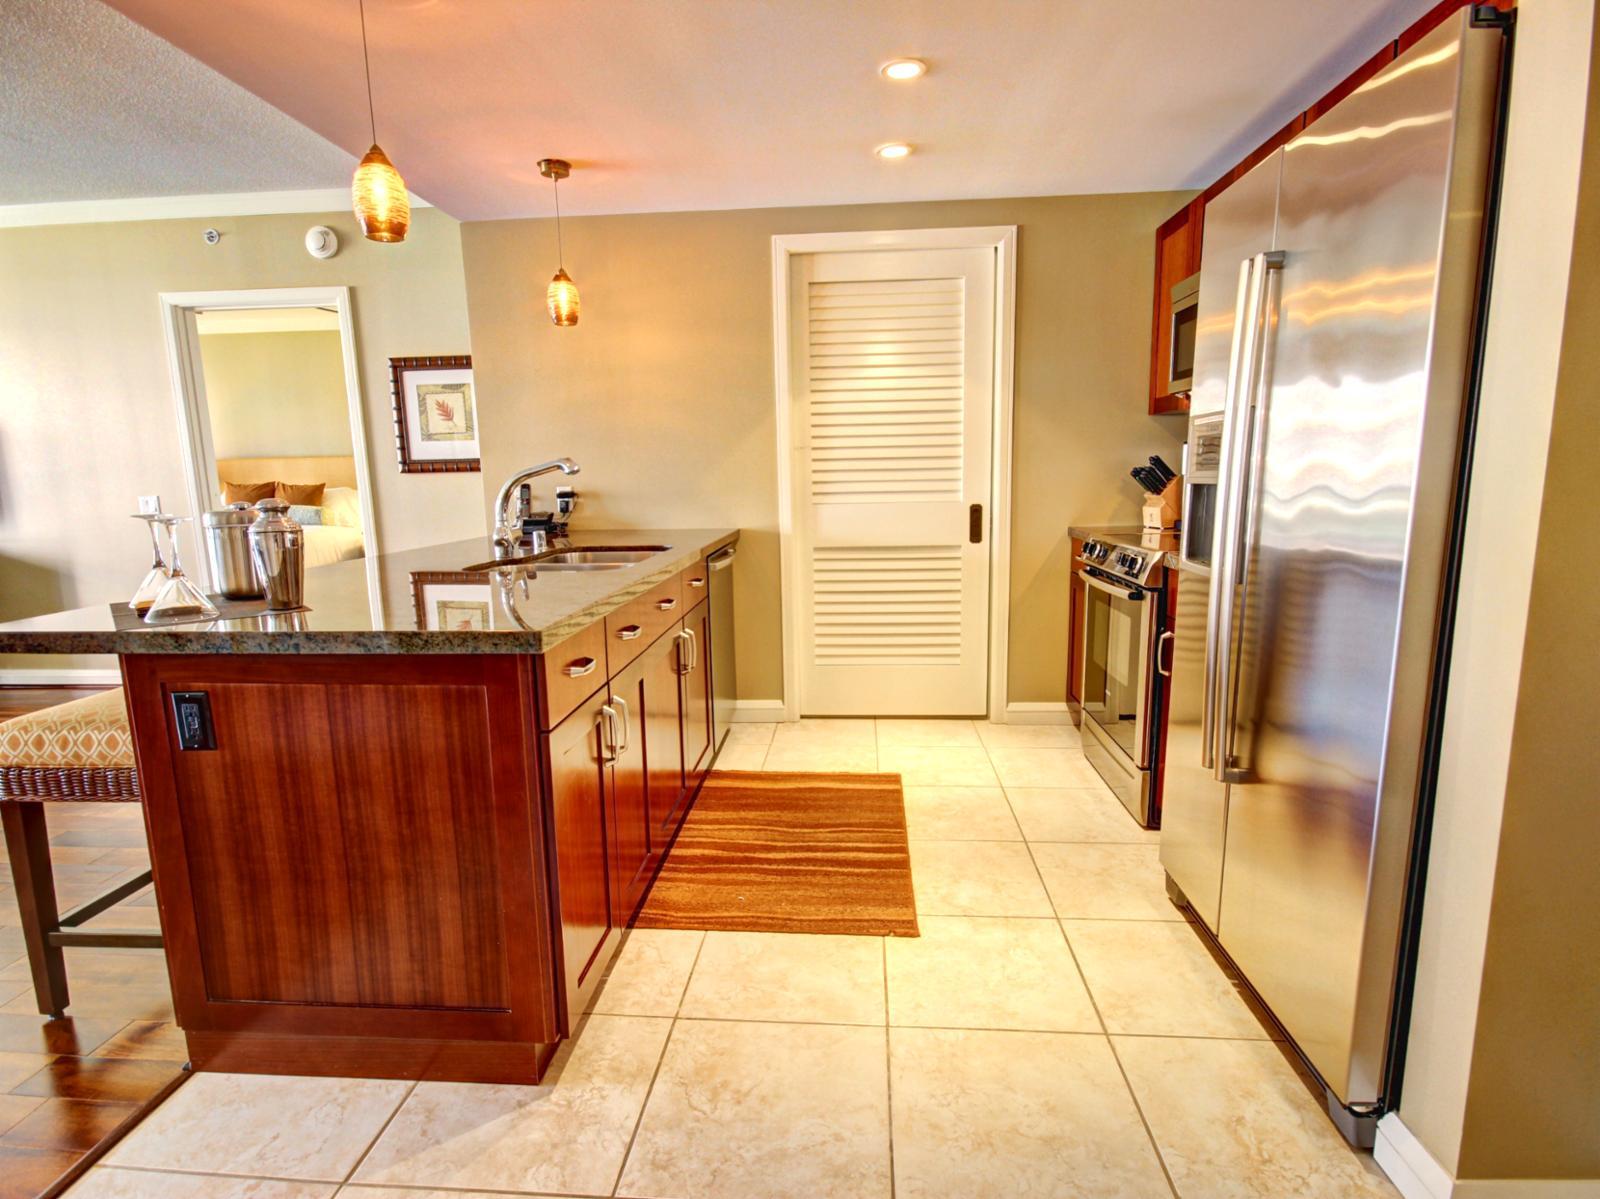 Gourmet kitchen with full size Bosch Appliances.